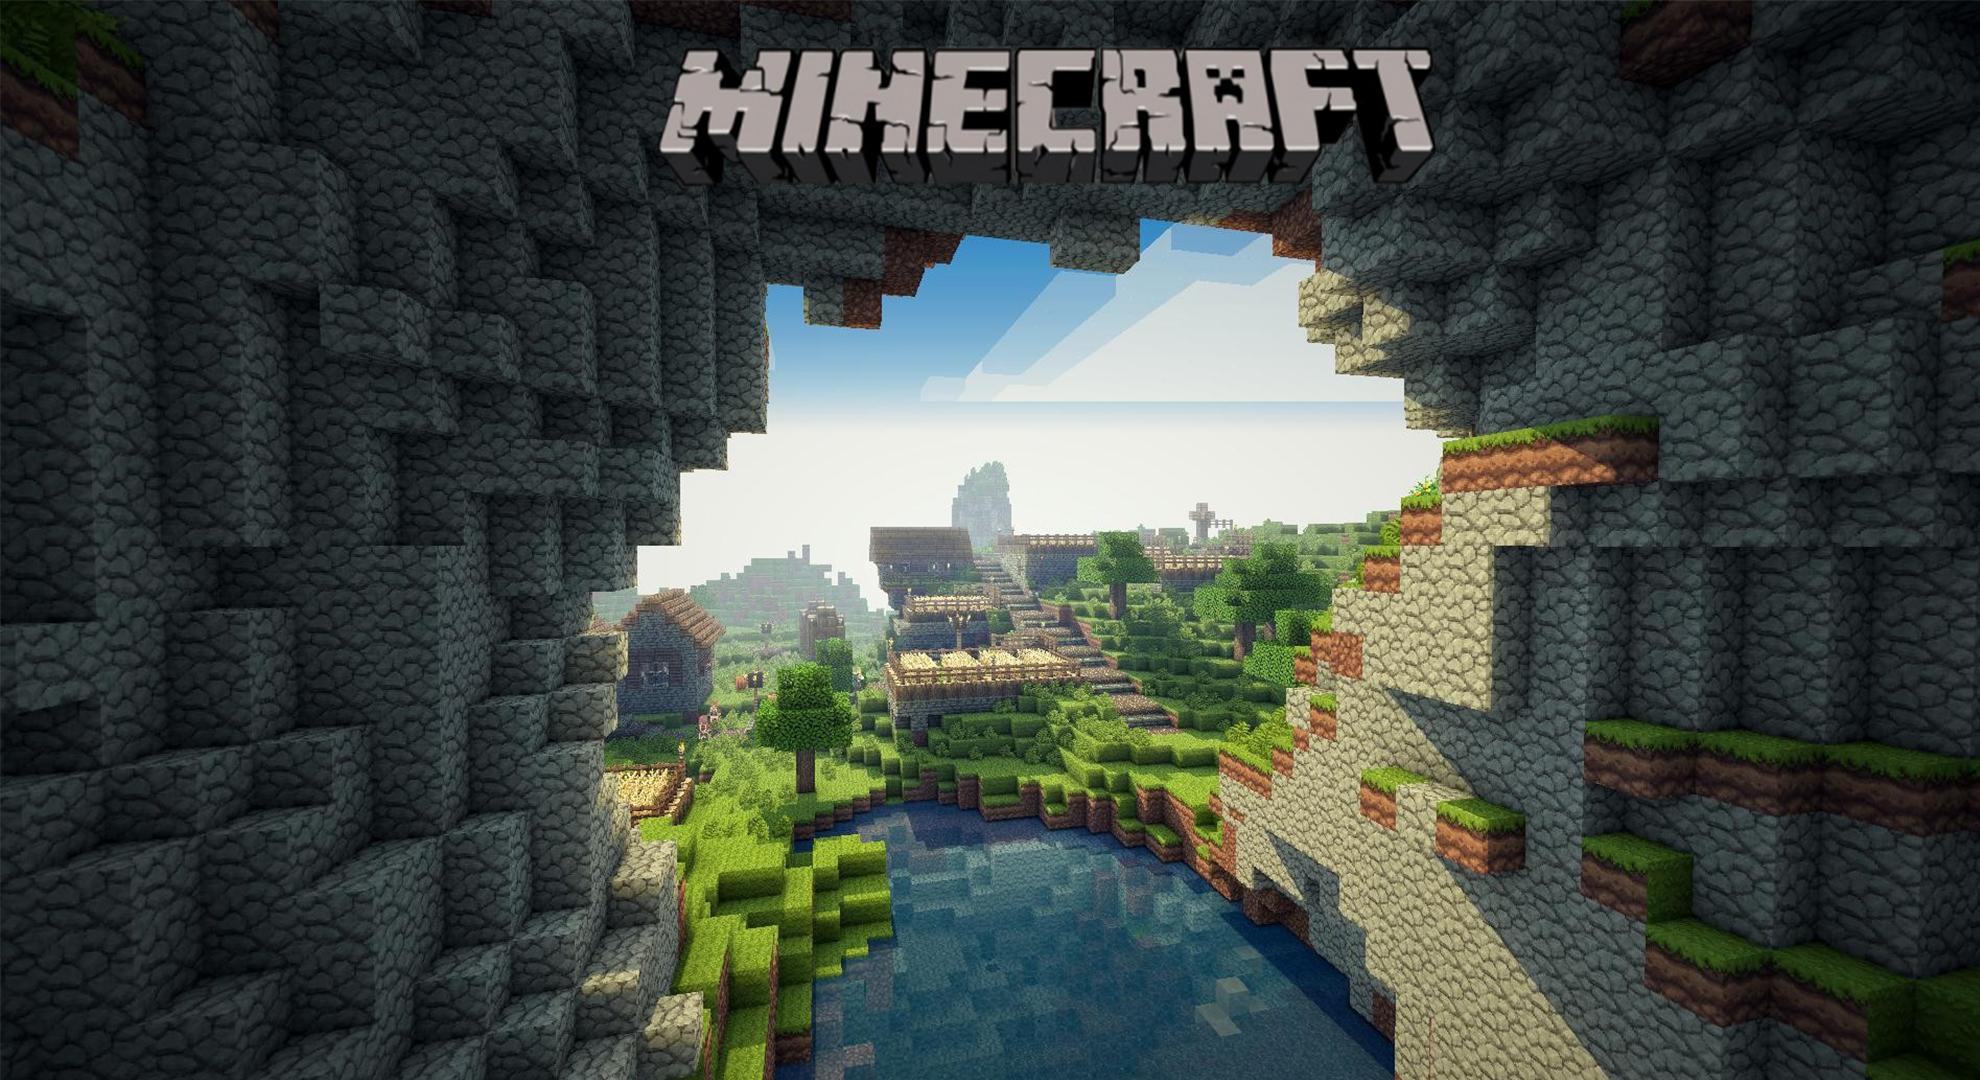 11+] Minecraft Wallpaper for Amazon Fire on WallpaperSafari